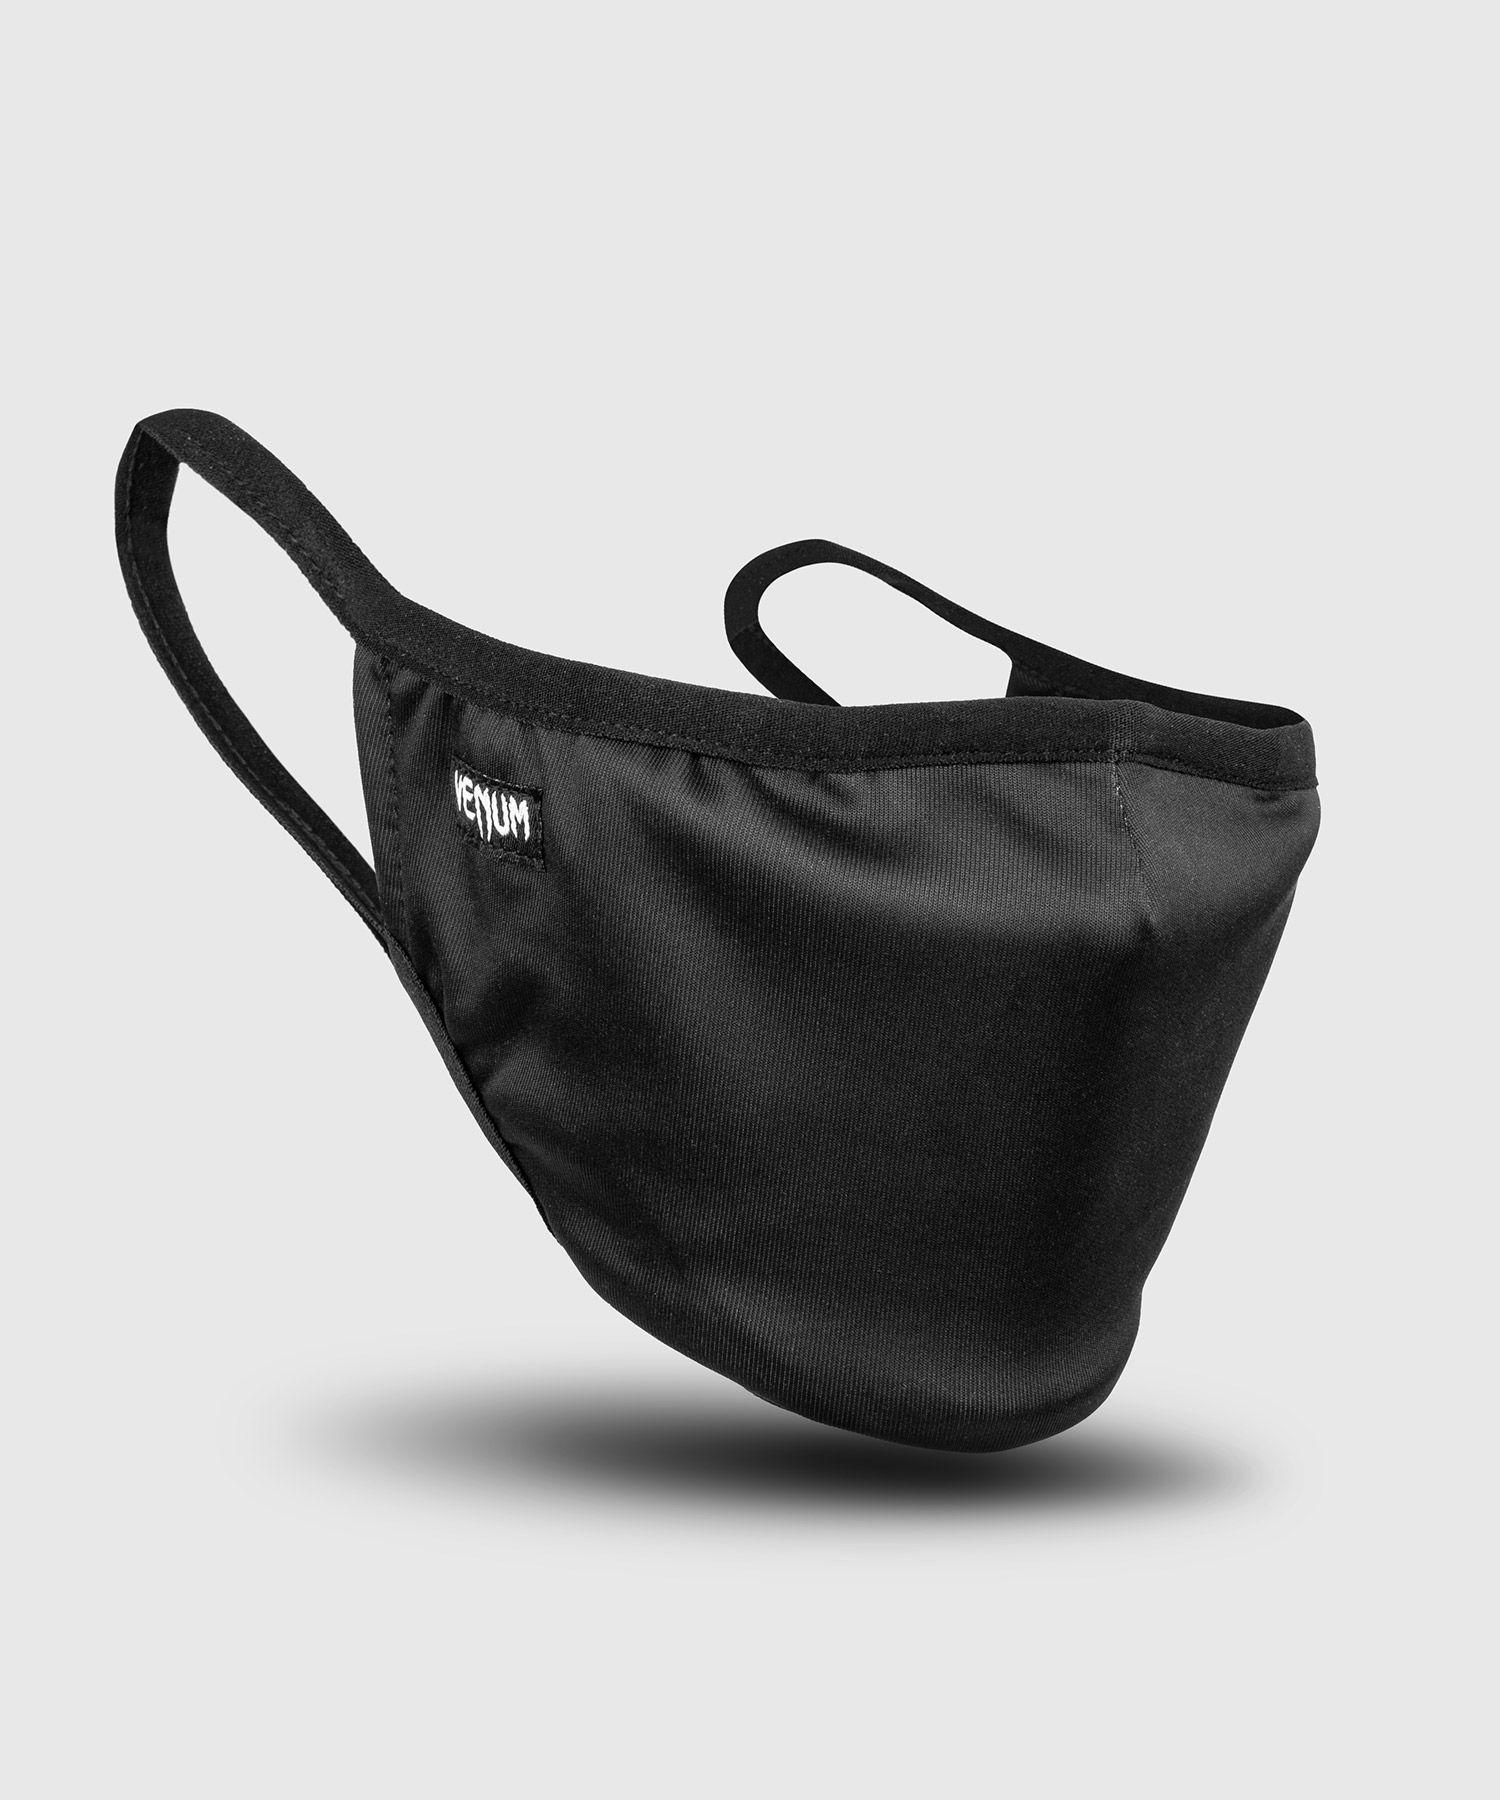 VENUM フェイスマスク (ブラック) //大人用 マスク 個包装 洗えるマスク ファッションマスク 花粉対策 スポーツ 送料無料